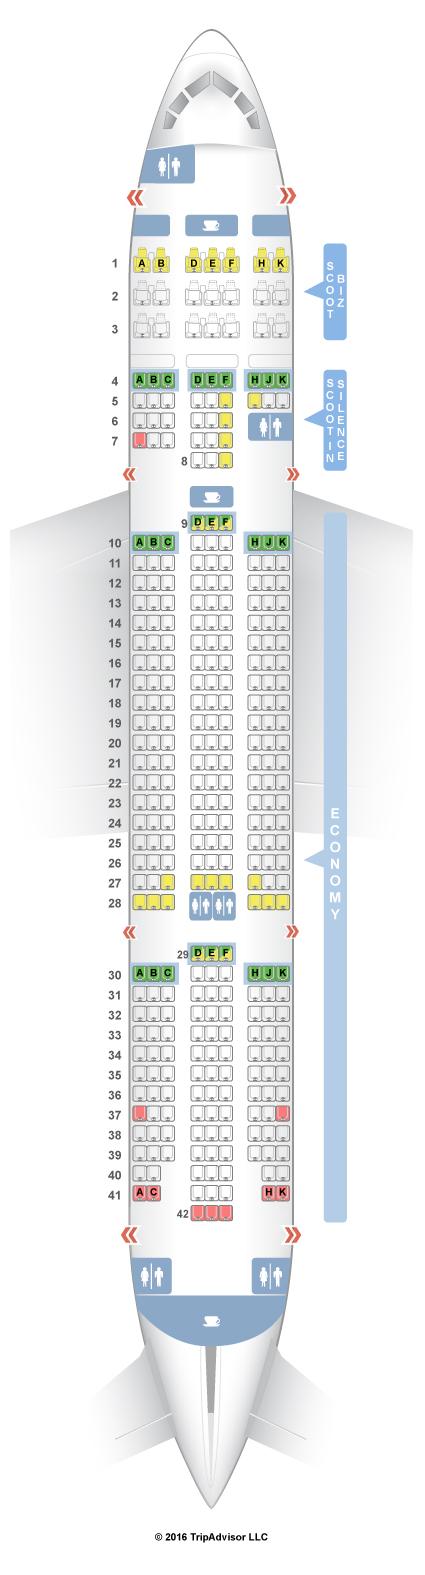 Dreamliner Floor Plan - Floor Plan Ideas